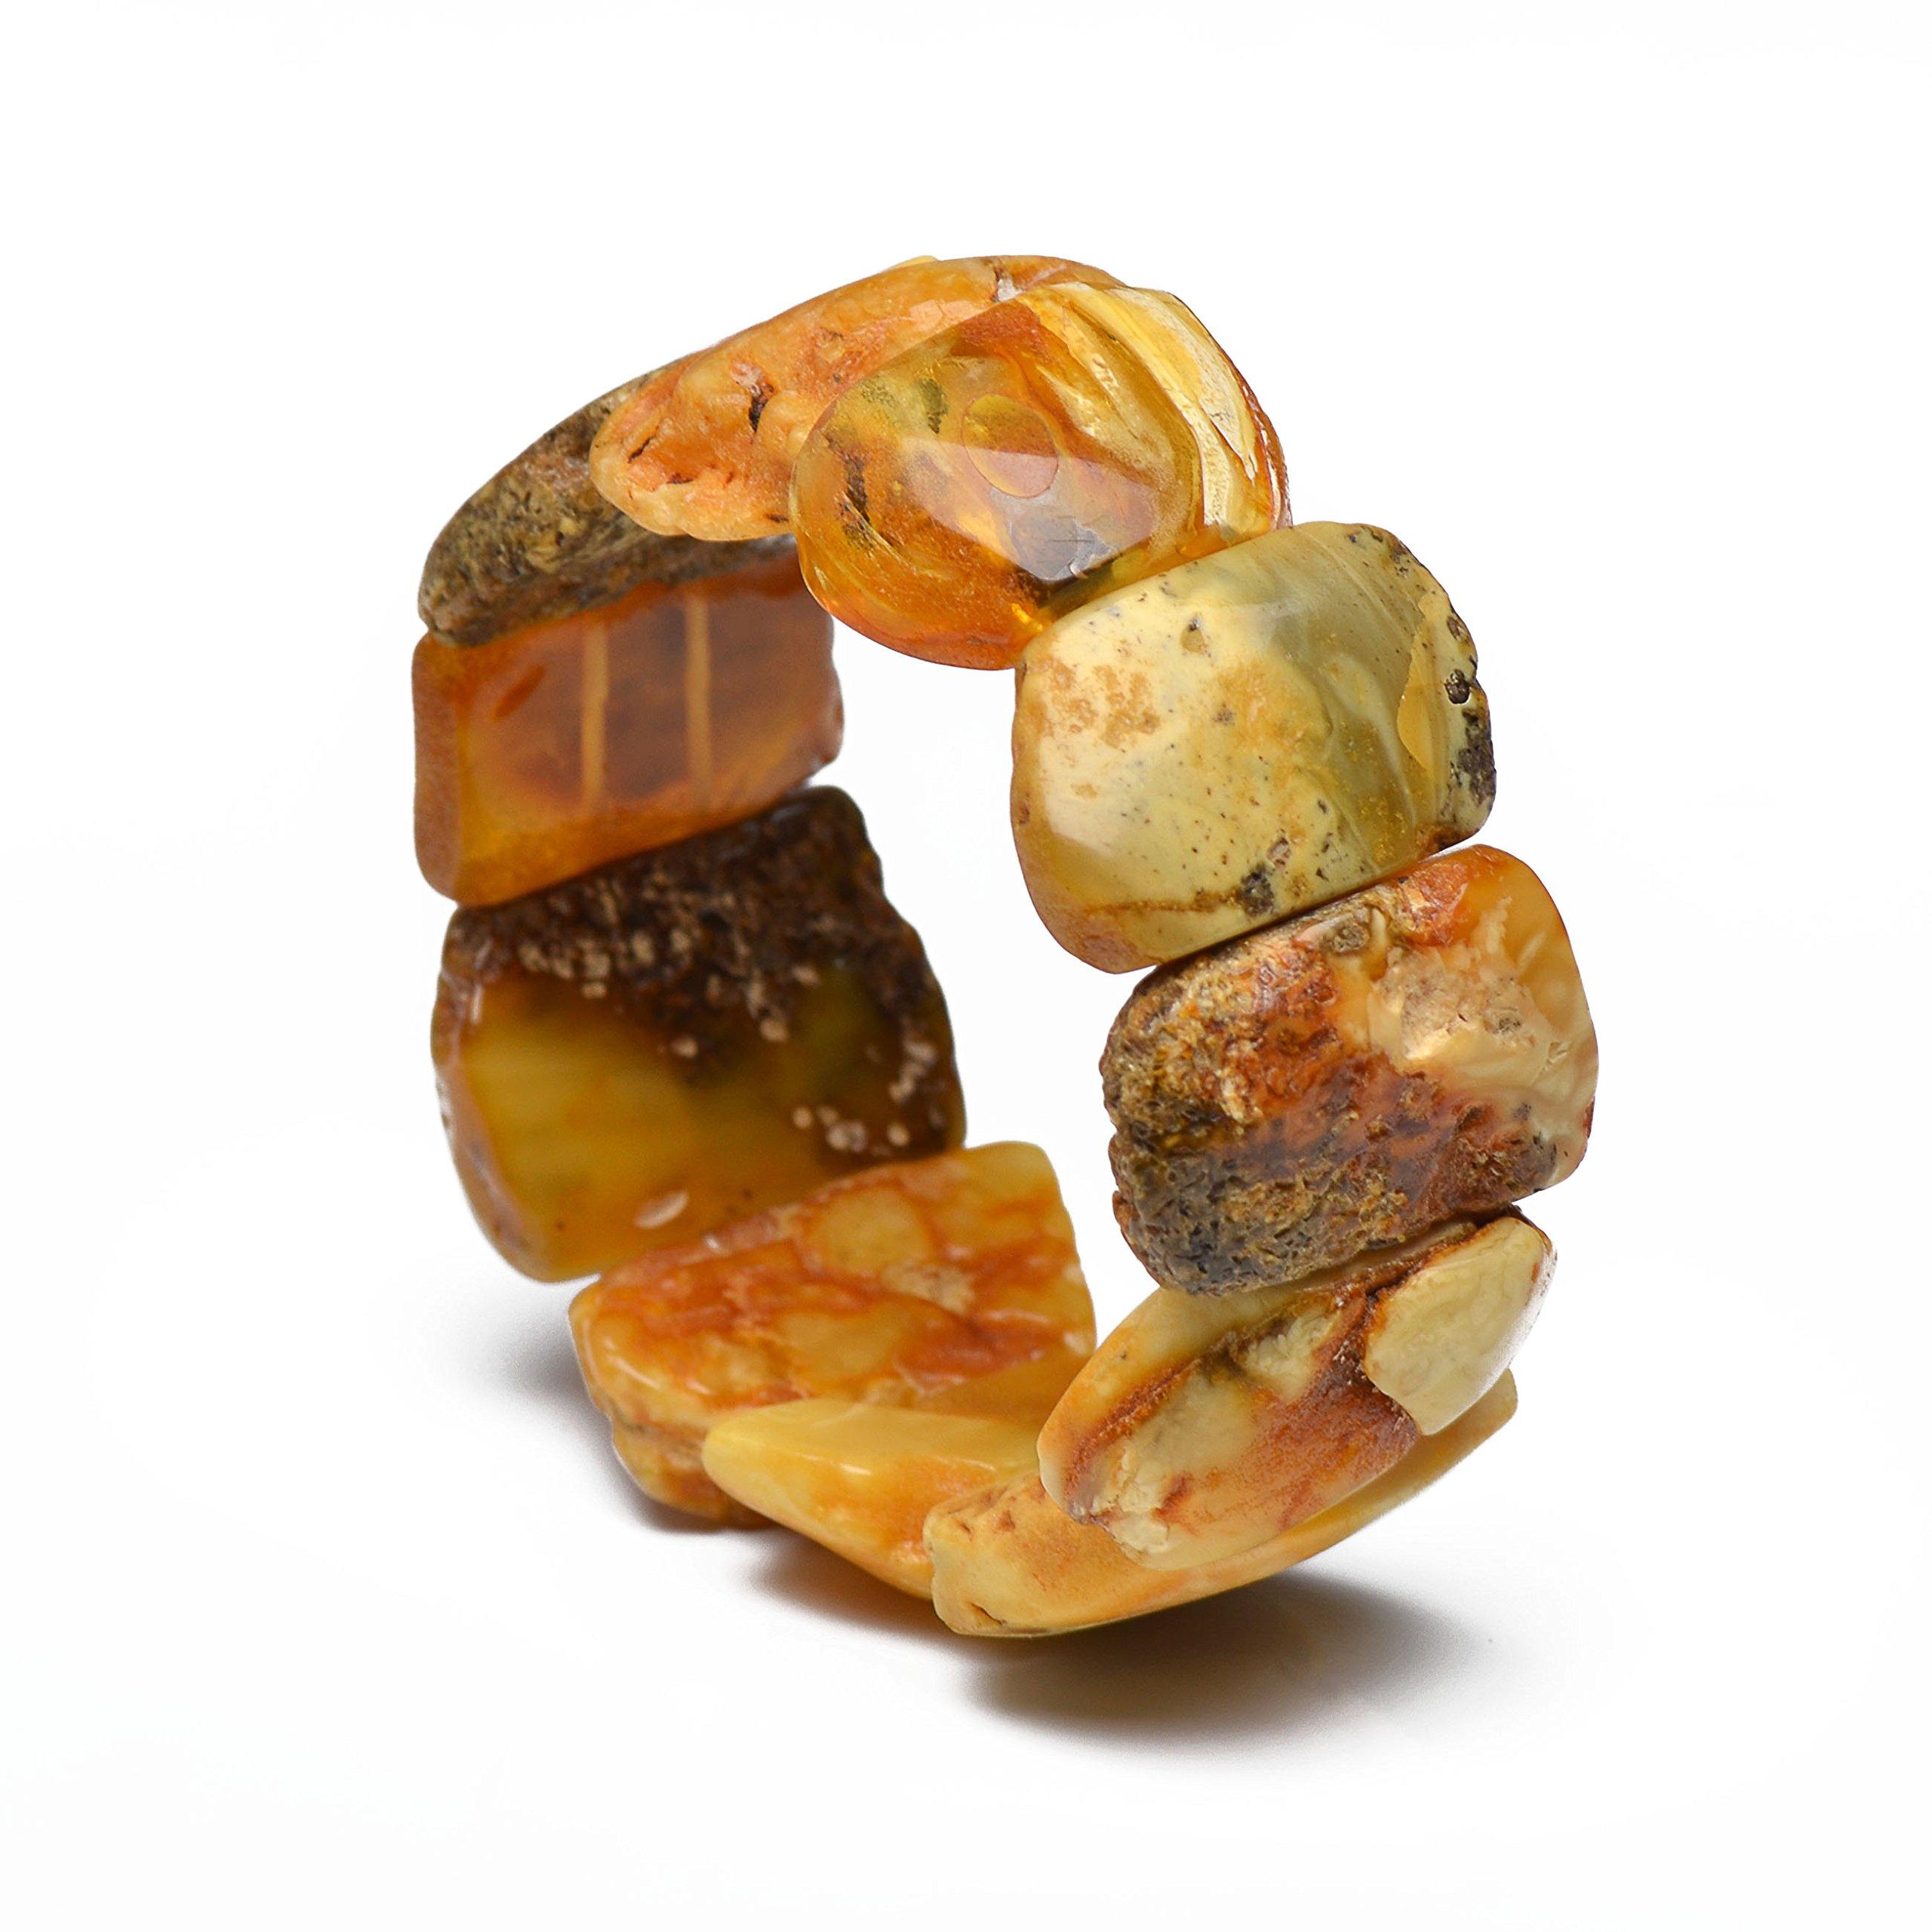 Massive Unique Amber Bracelet for Woman - Vintage Amber Bracelet - Handmade Amber Jewelry - 100% Natural Certified Baltic Amber